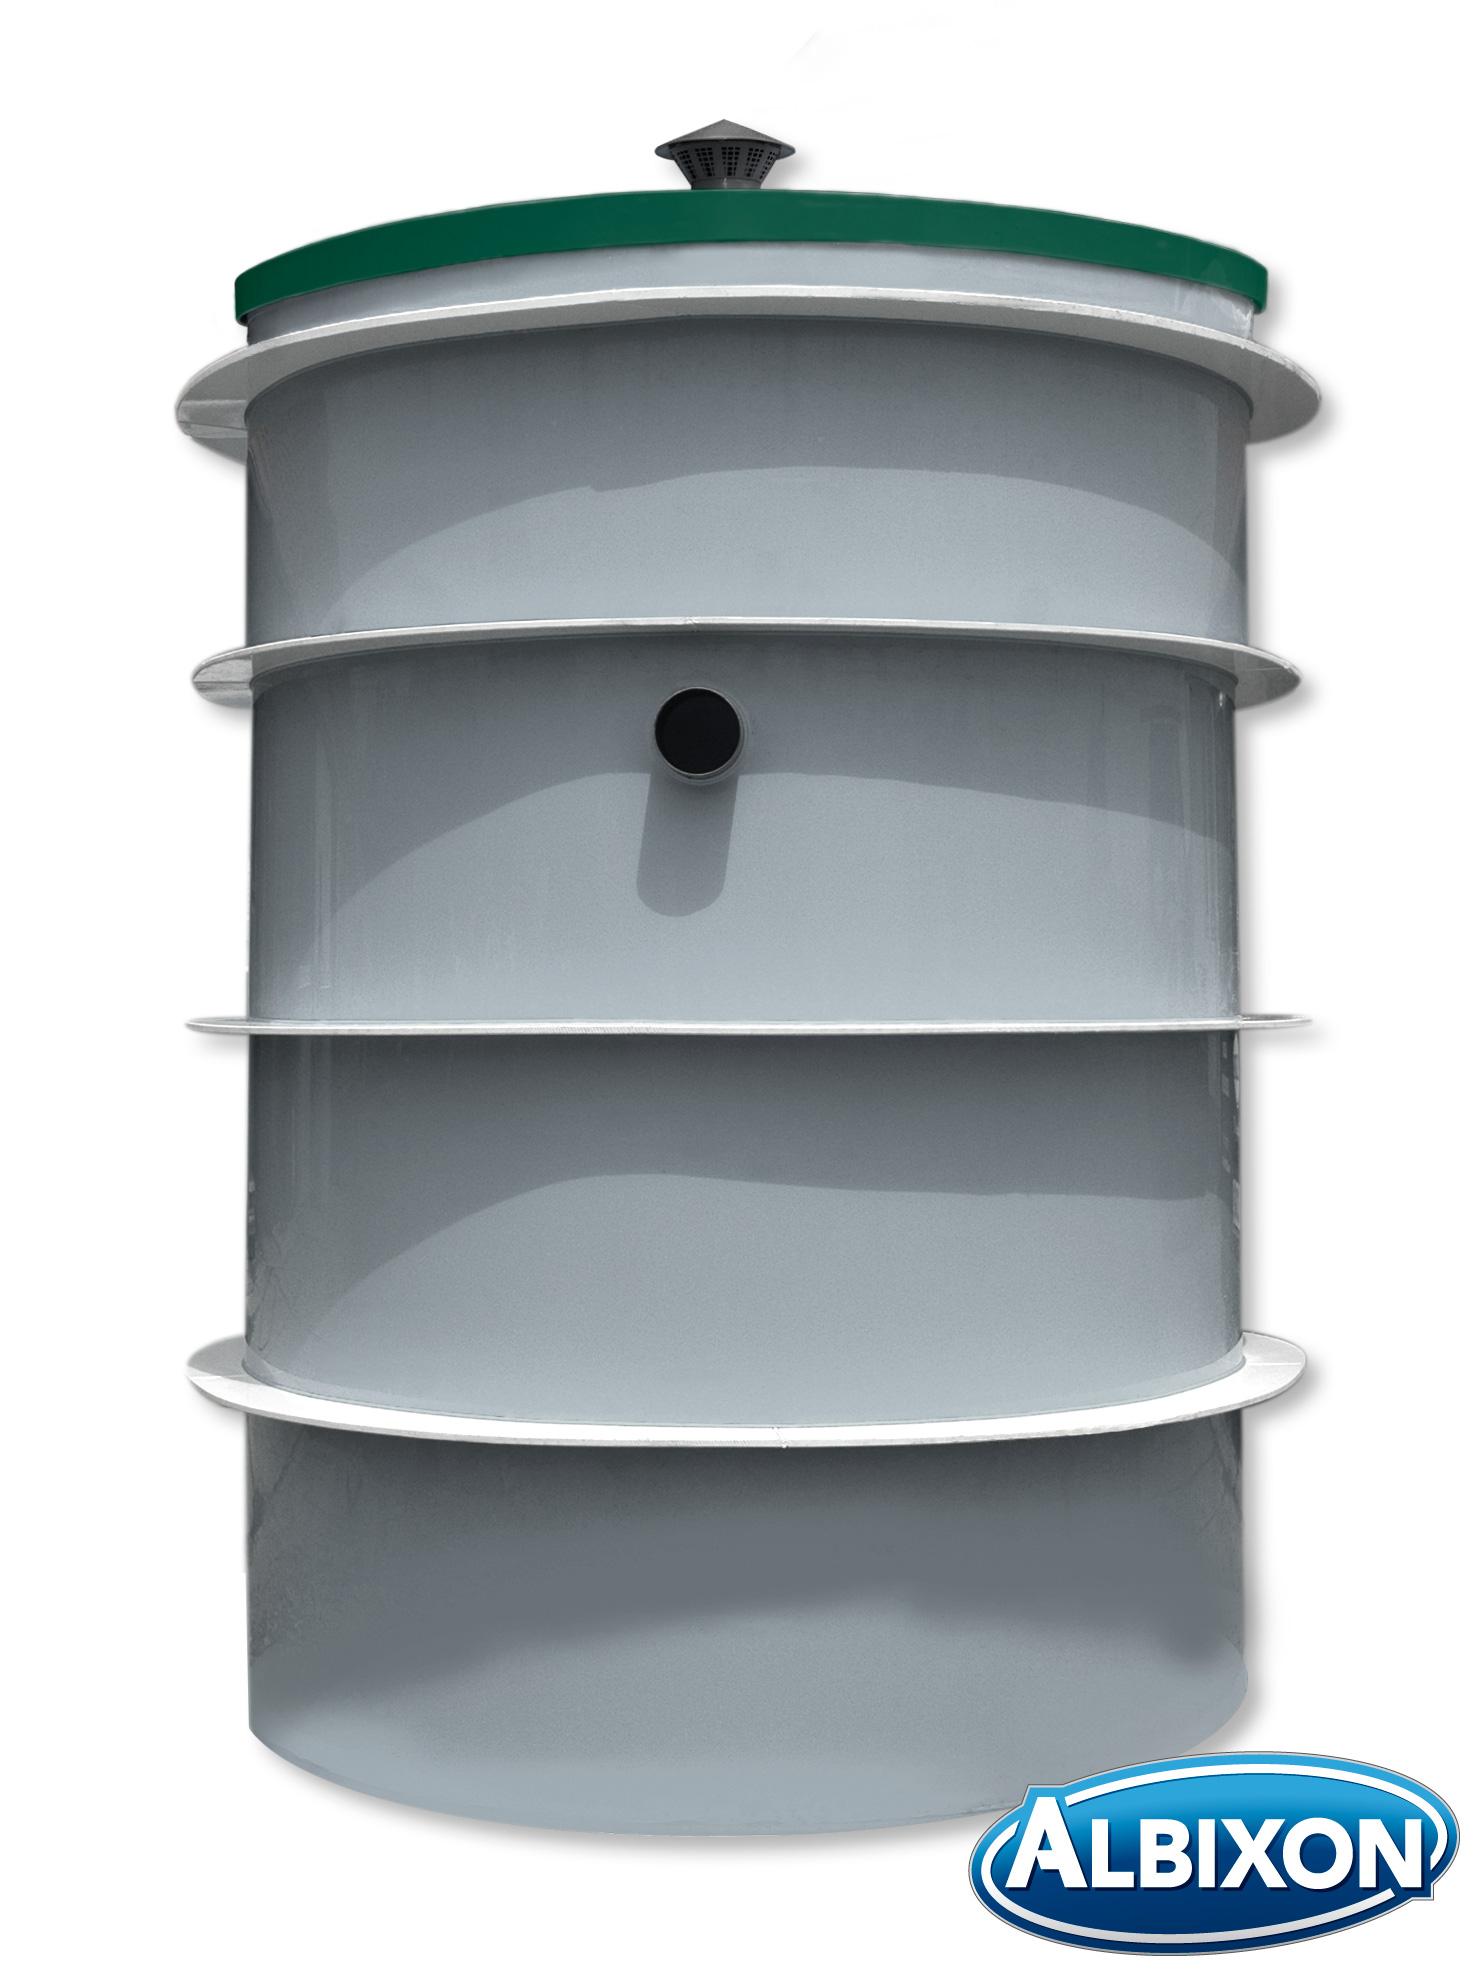 stations d 39 epuration collectives tous les fournisseurs. Black Bedroom Furniture Sets. Home Design Ideas